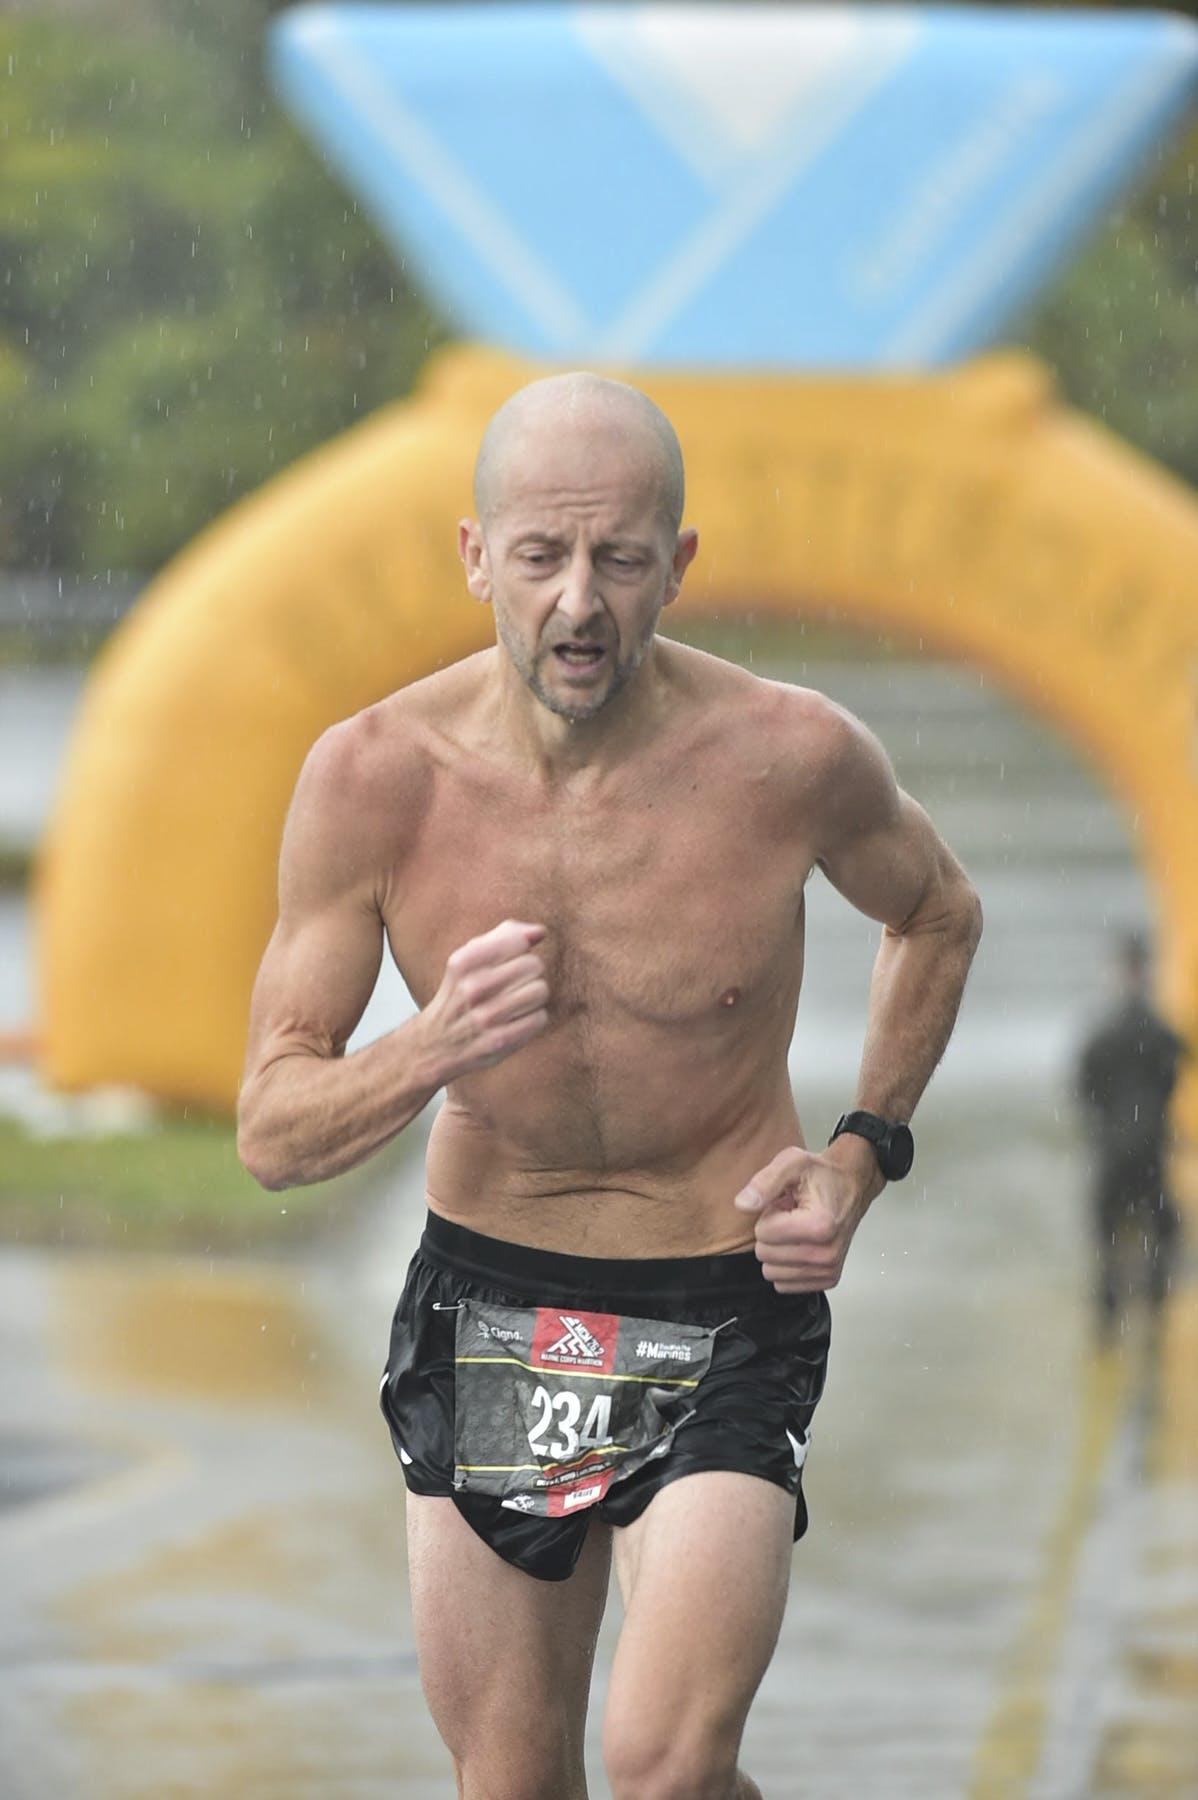 Boston Marathon at age 48